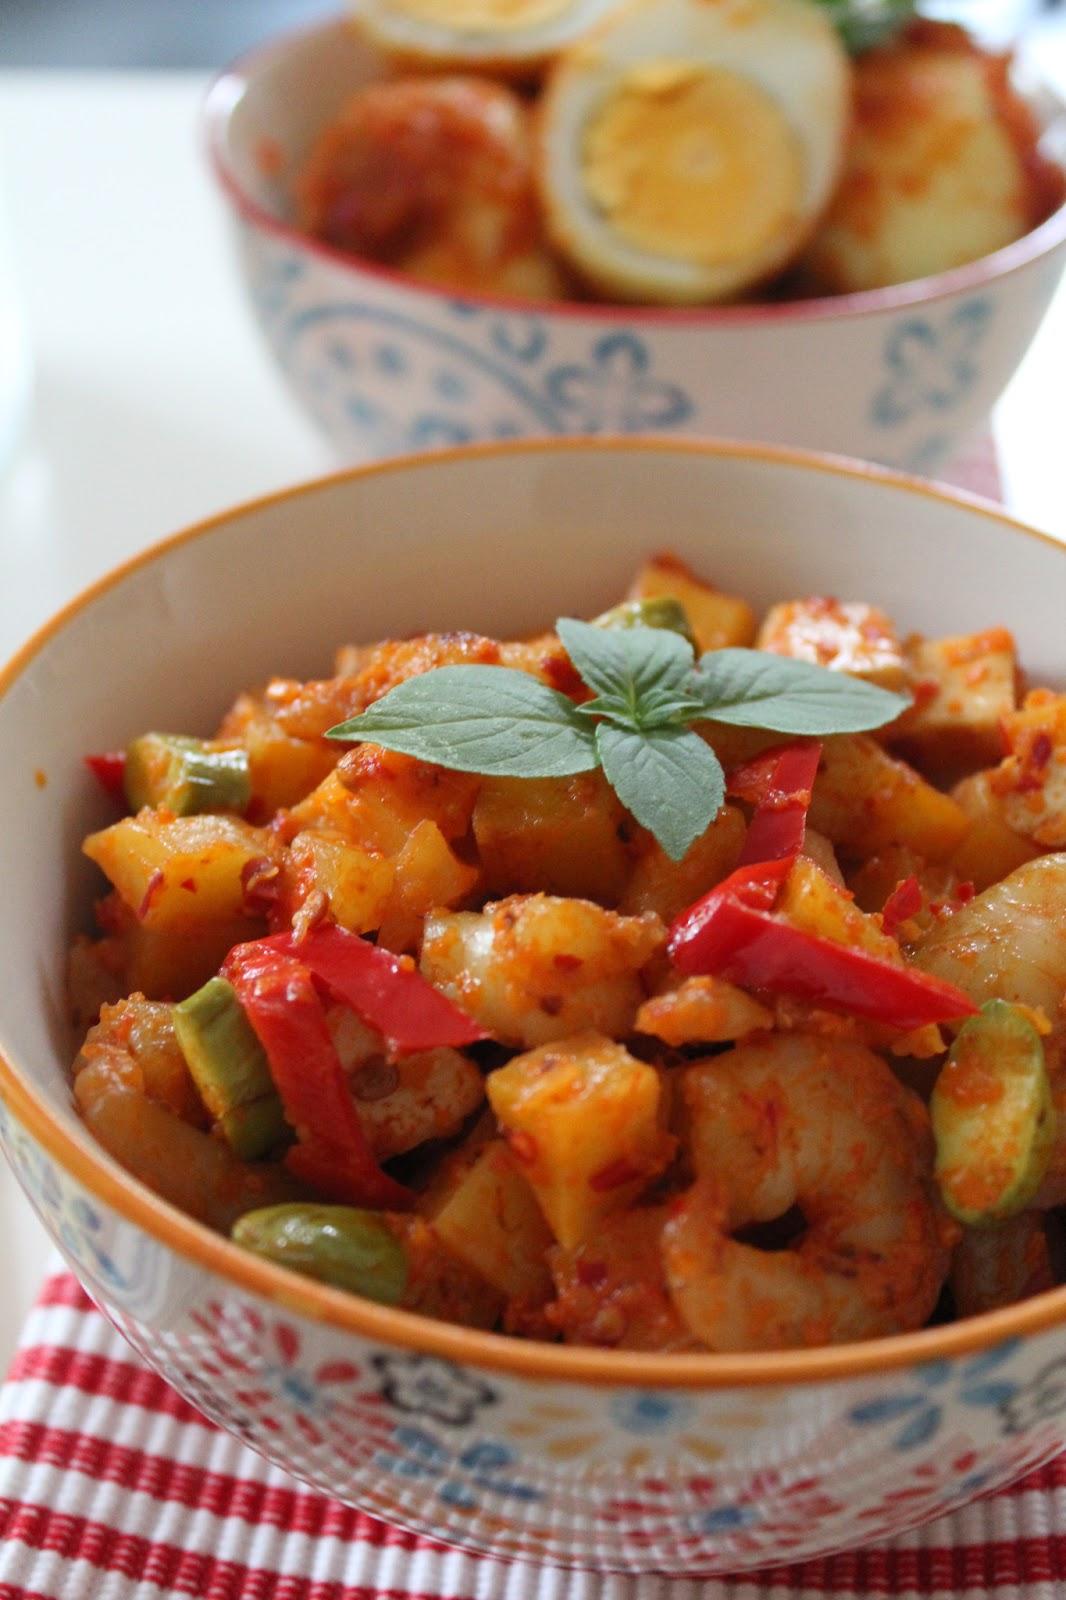 Indonesian Food: Sambal Goreng Udang (Spicy Shrimps Sauteed)